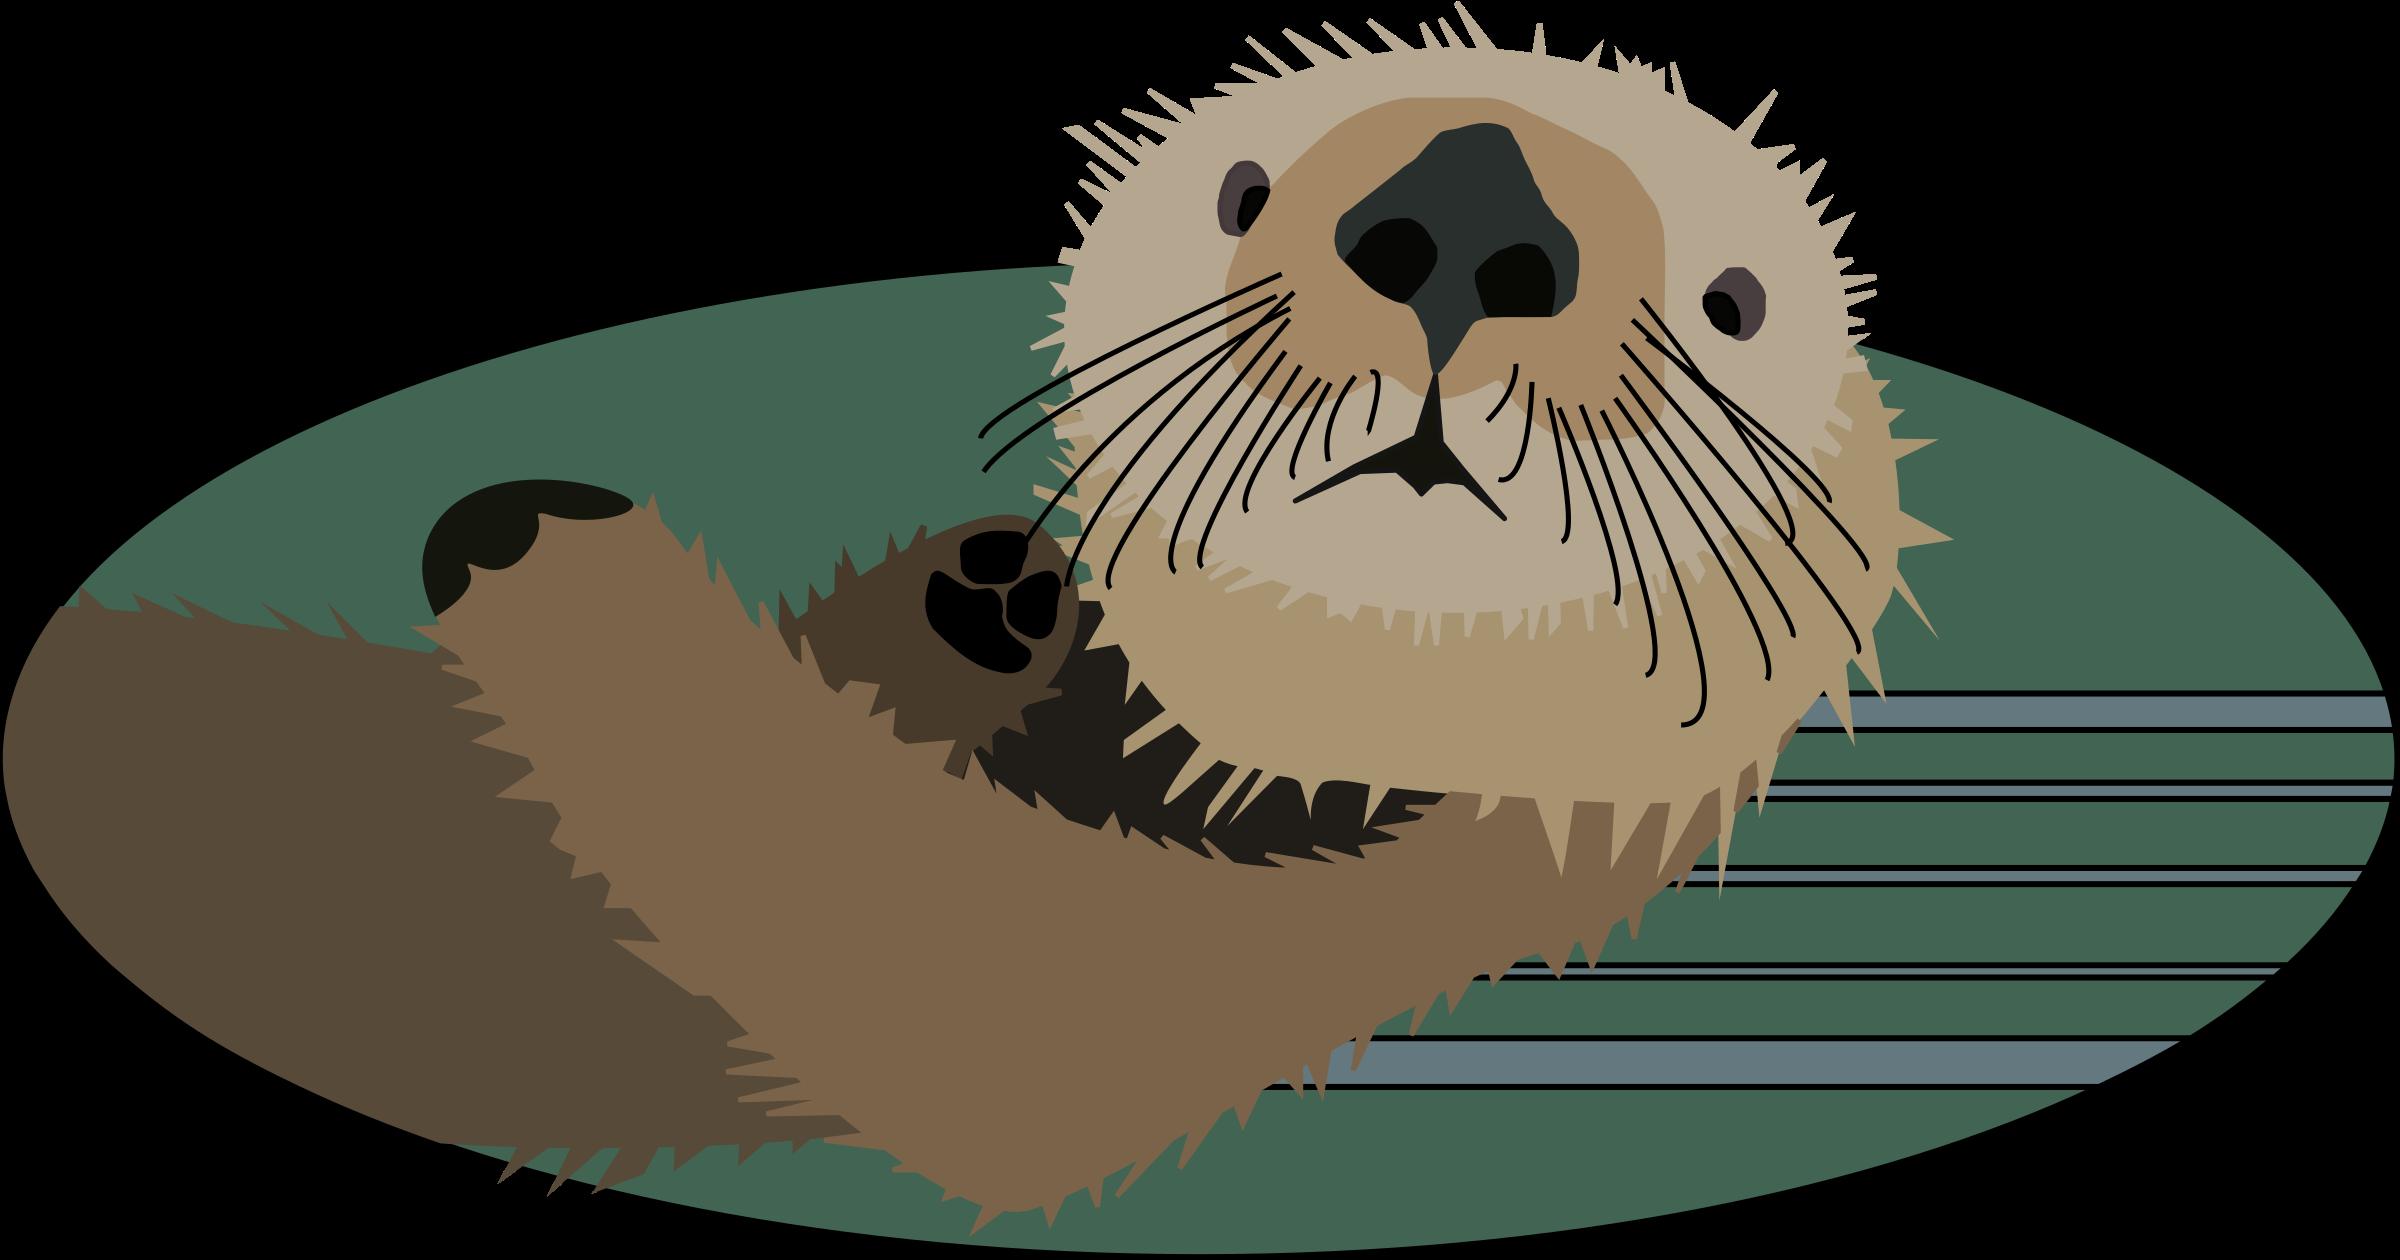 Seal clipart sea otter. Northwest coast native art